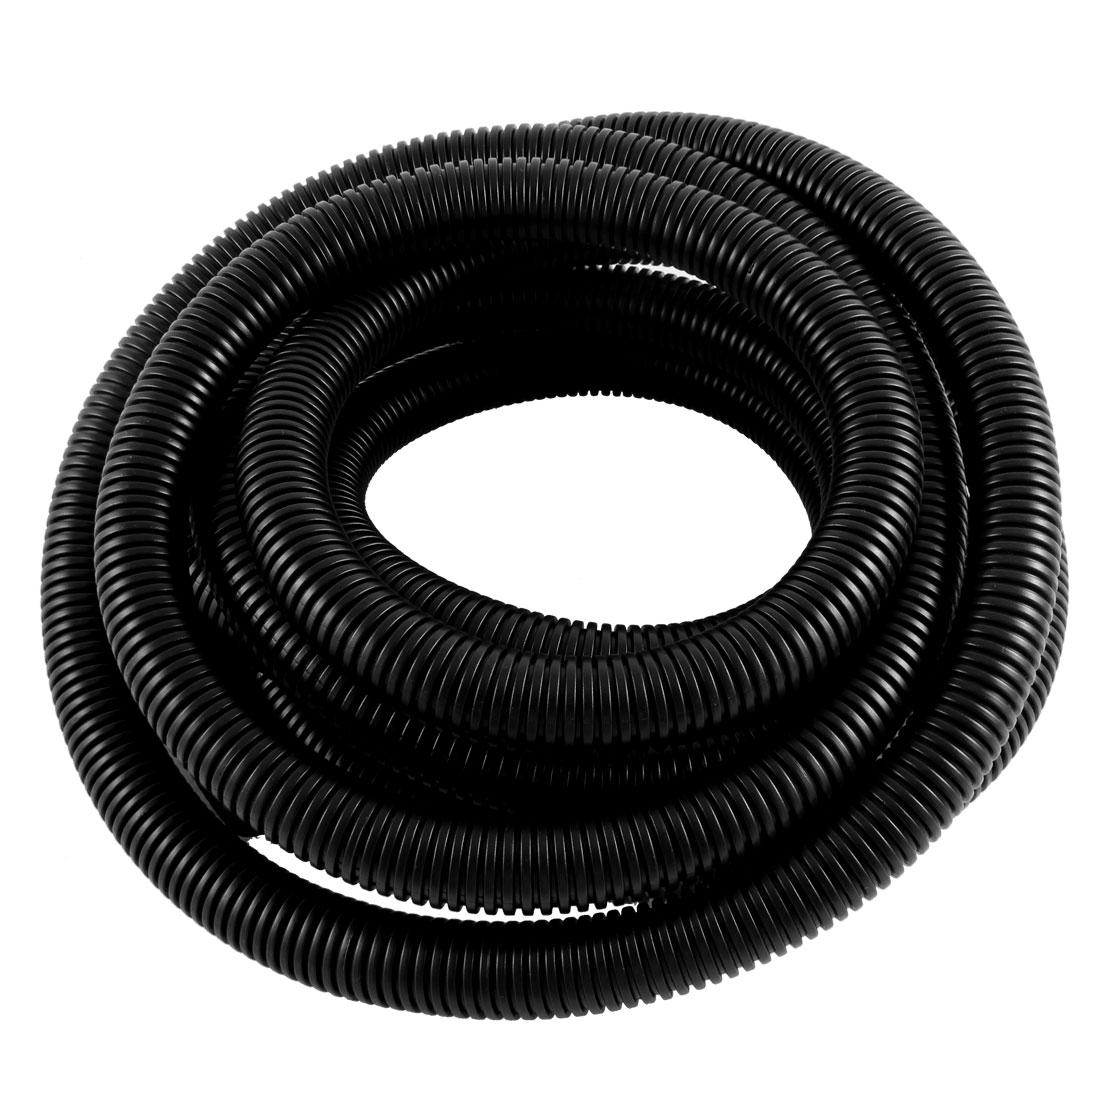 Black Flexible Corrugated Tube Hose Tubing 21.2mm OD 4m Length